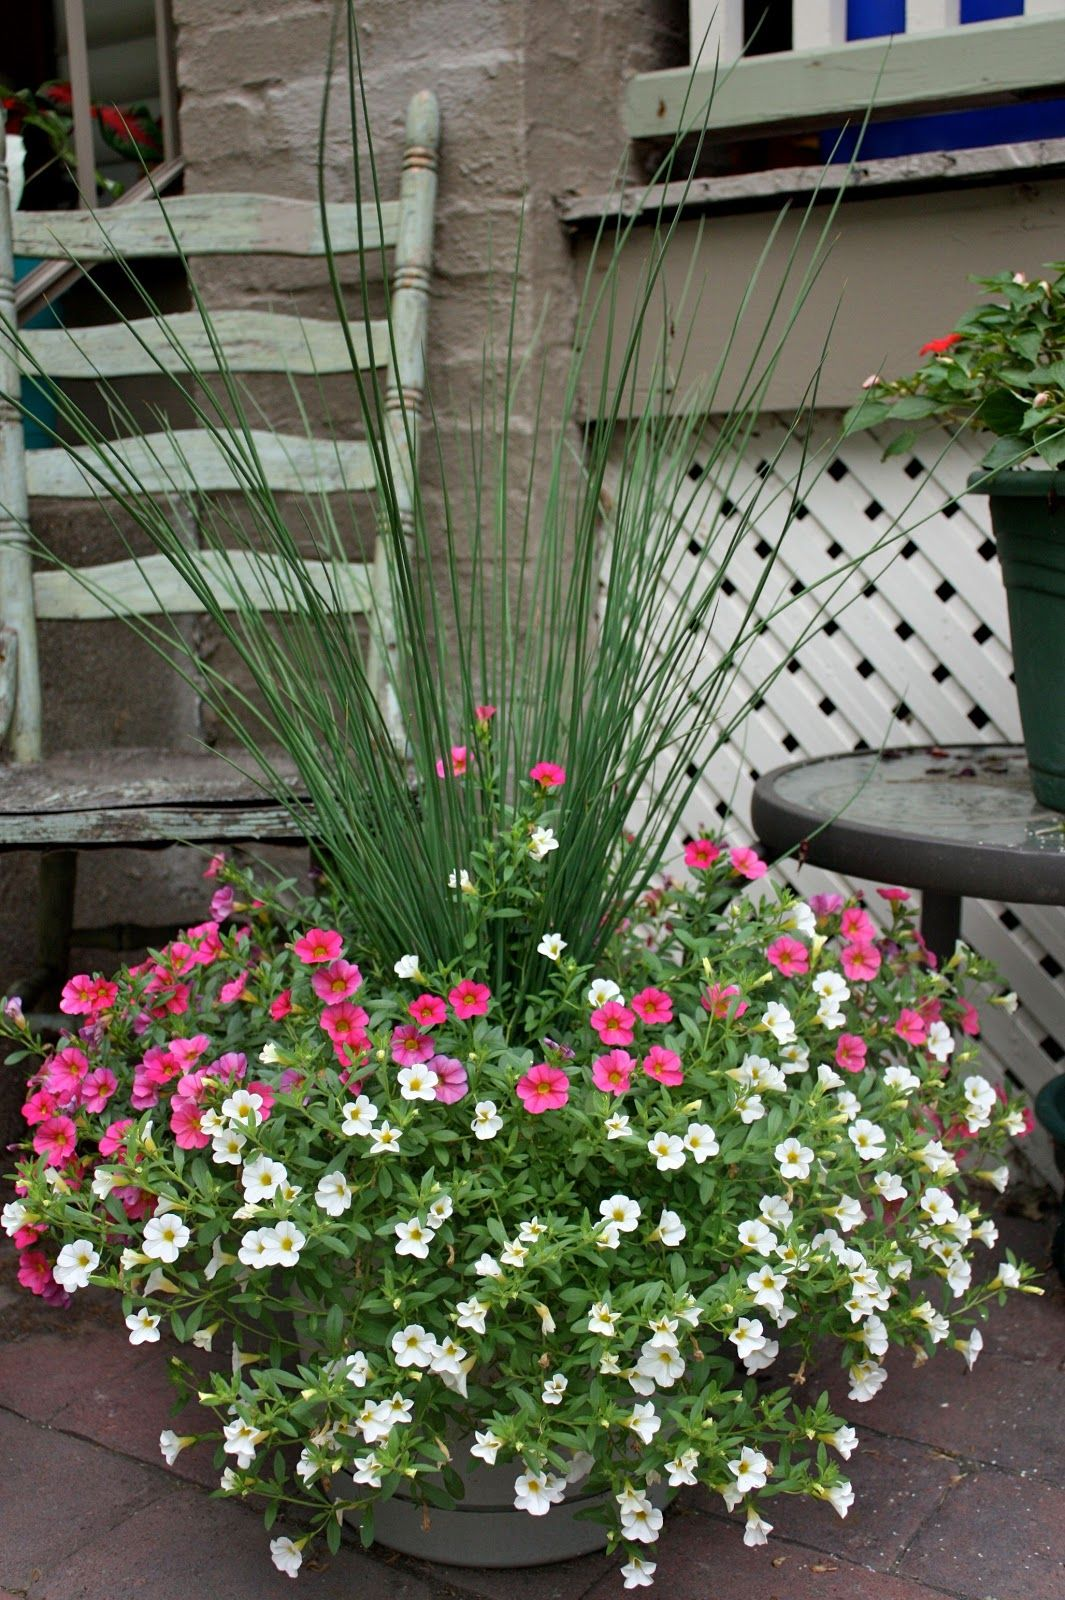 fd098cecb4bbb0d35d1a9f807731797a - What Is Zone 5b For Gardening